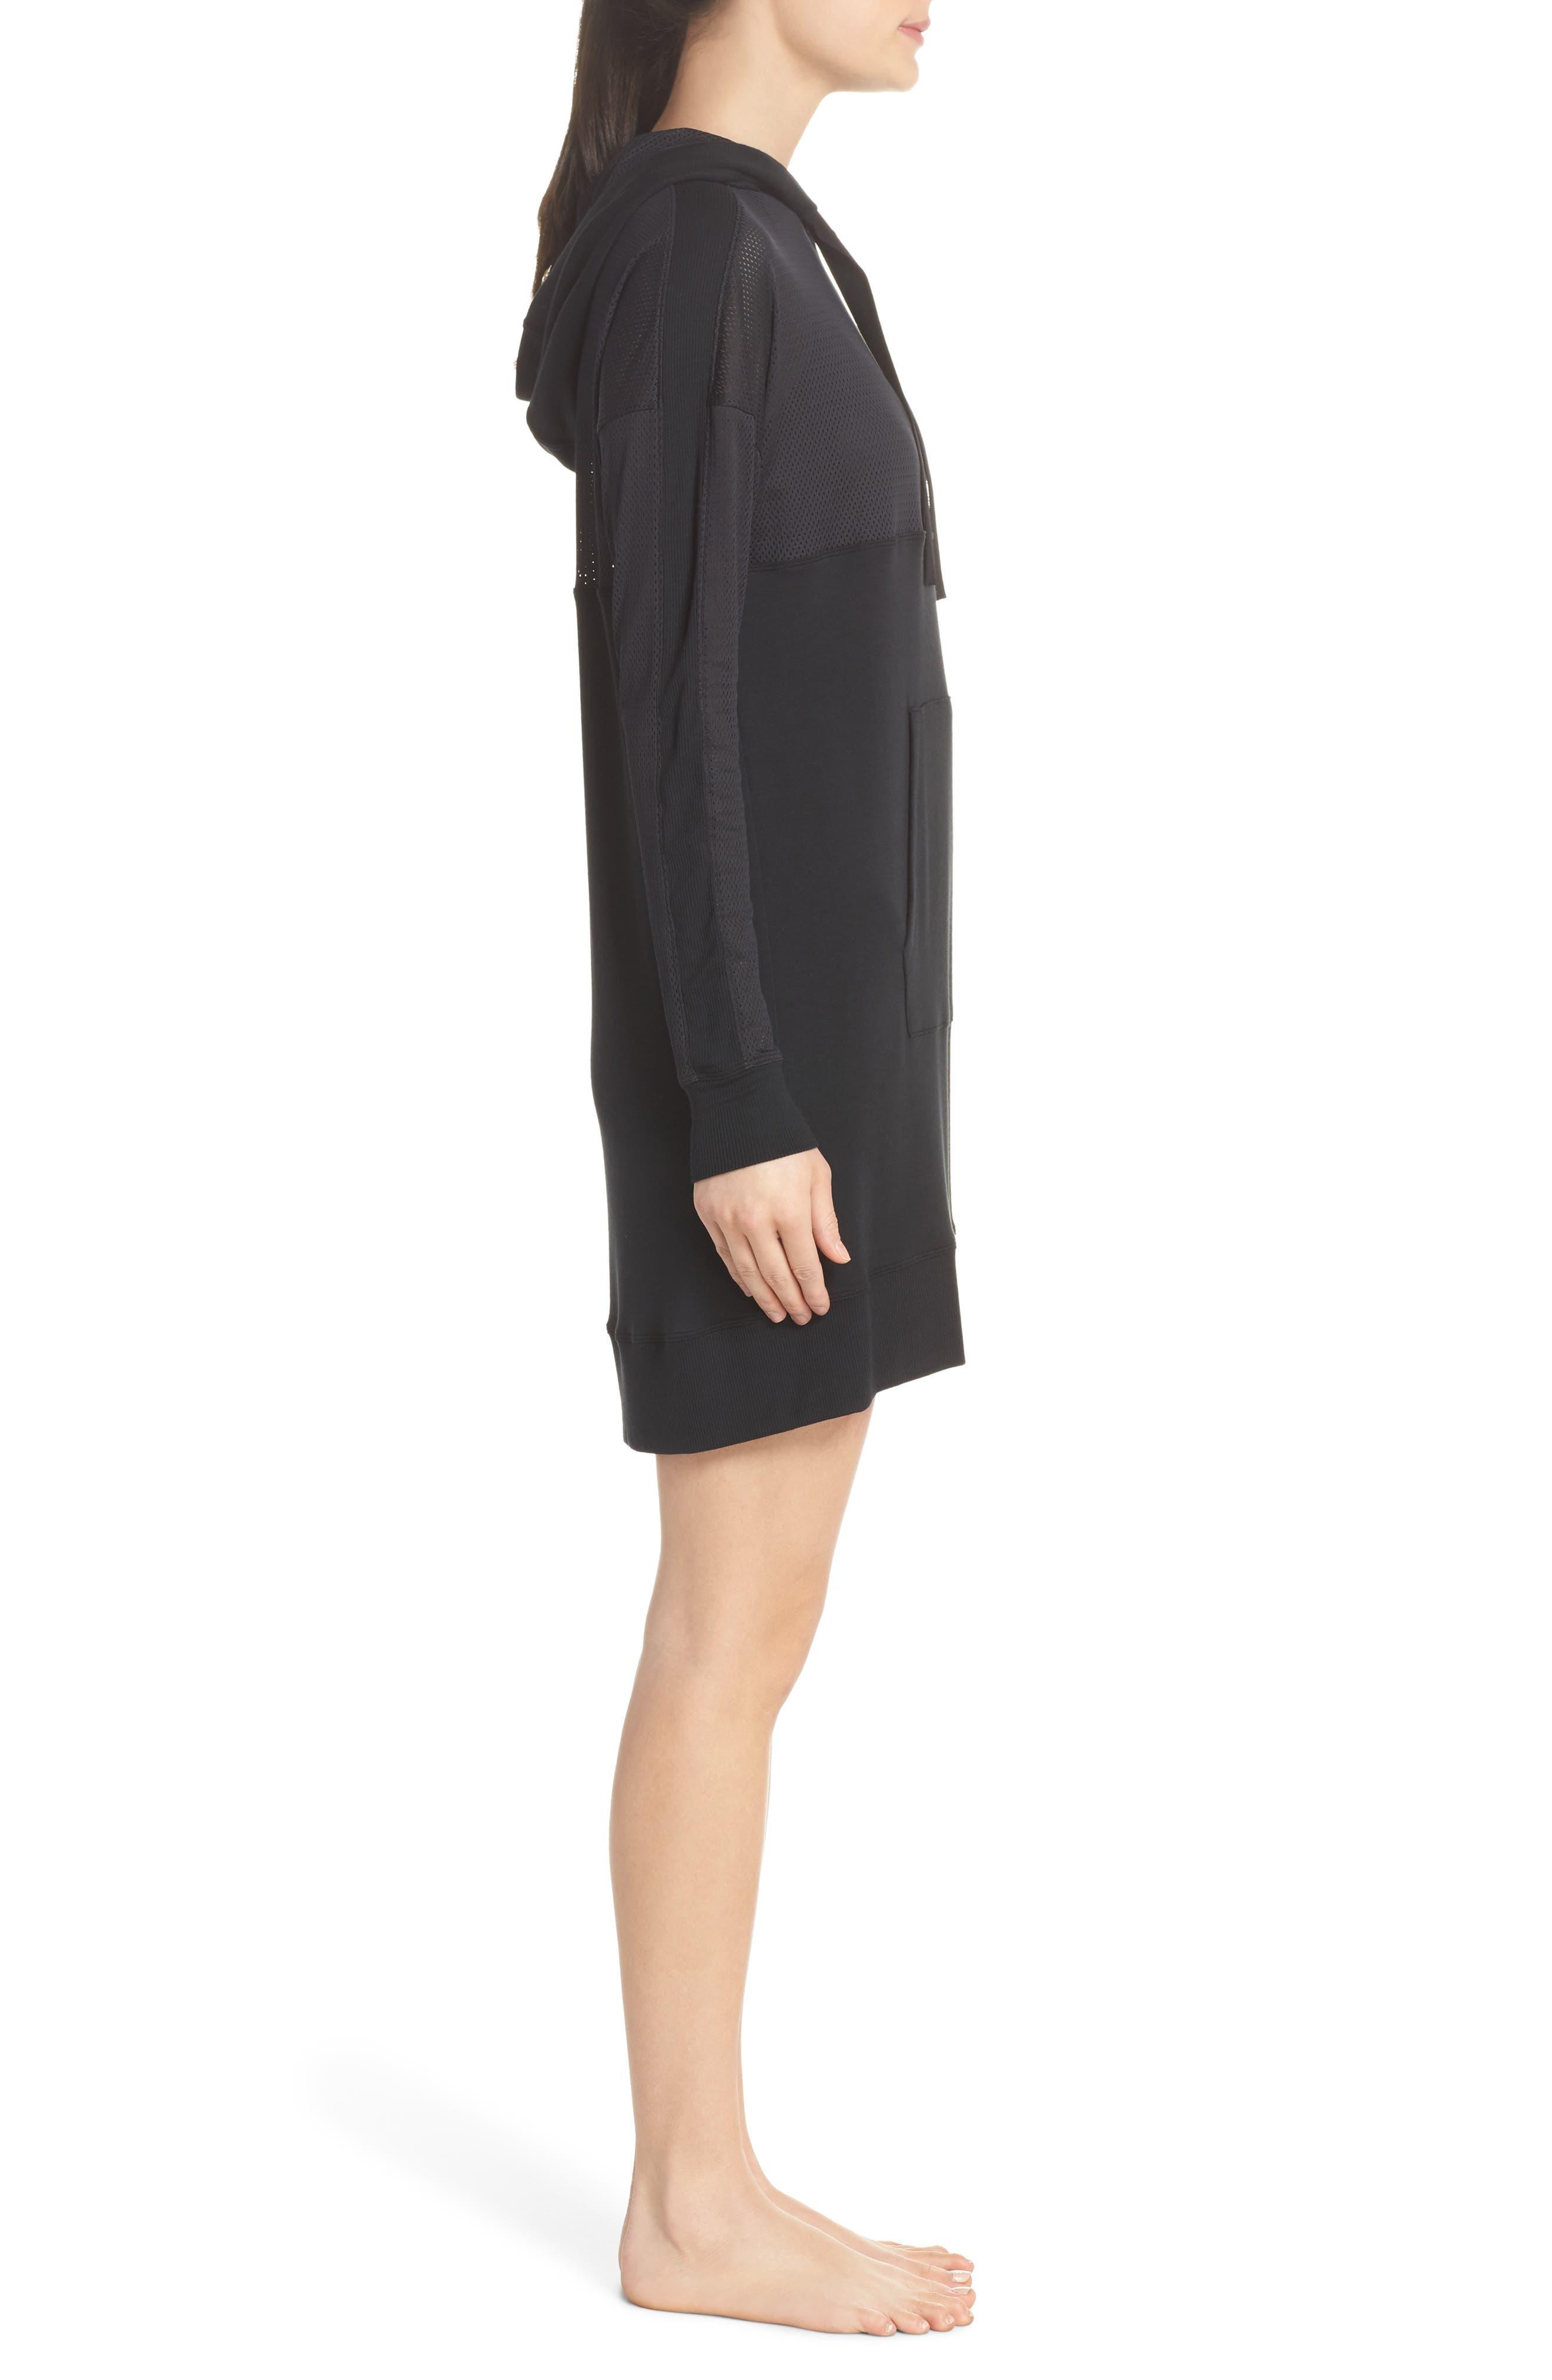 Range Dress,                             Alternate thumbnail 3, color,                             001